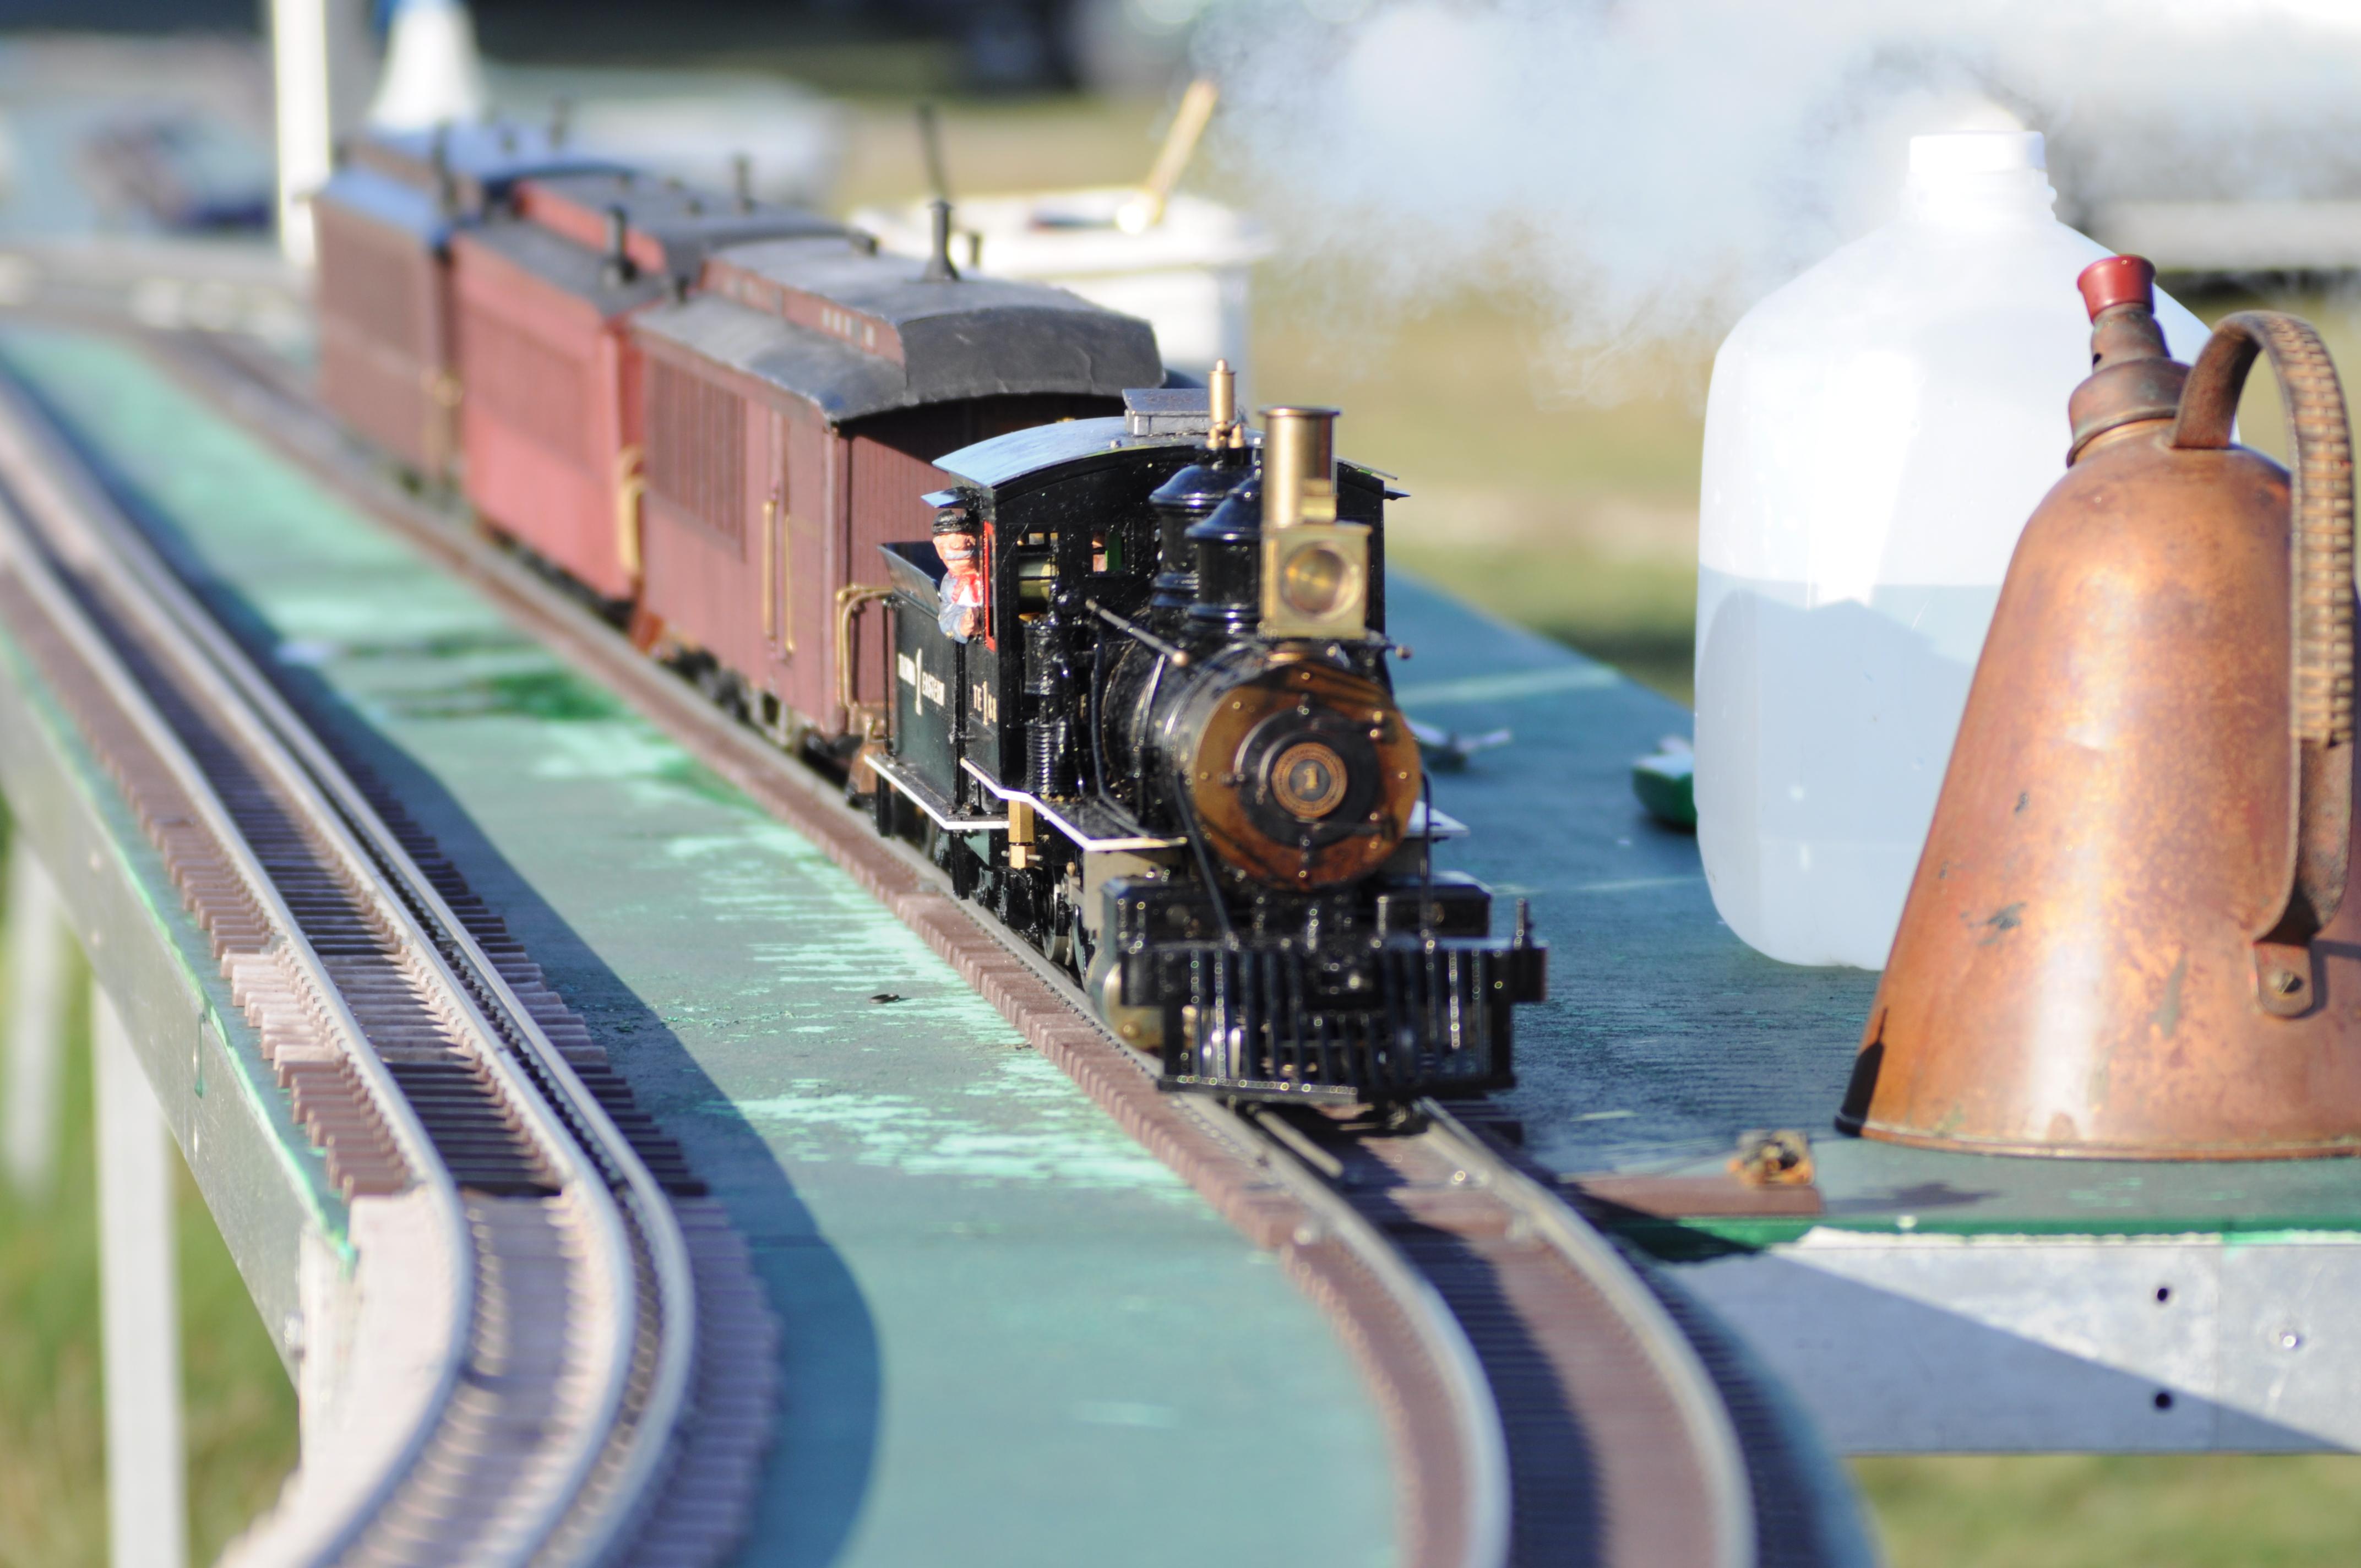 File:Model steam train 04.jpg - Wikimedia Commons